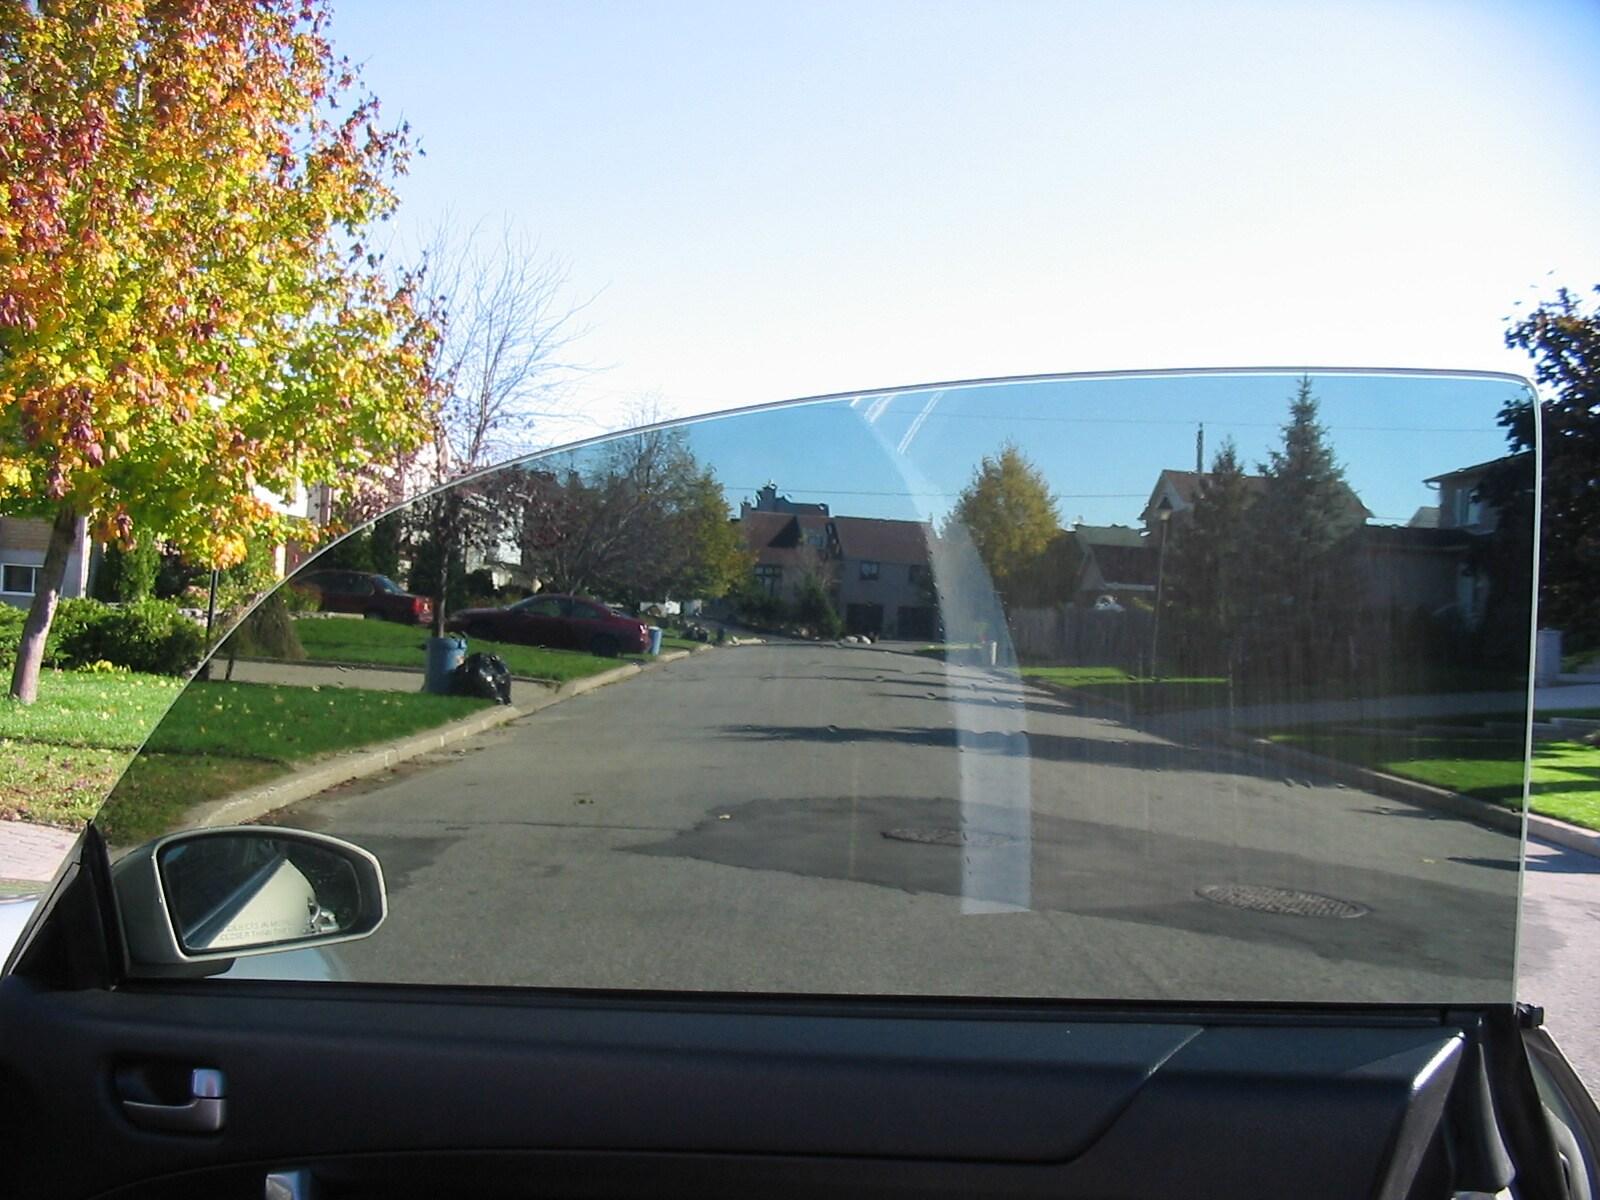 Aftermarket 3M Window Tint & Hyundai Aftermarket Window Tint from 3M - Chicago Window Tint